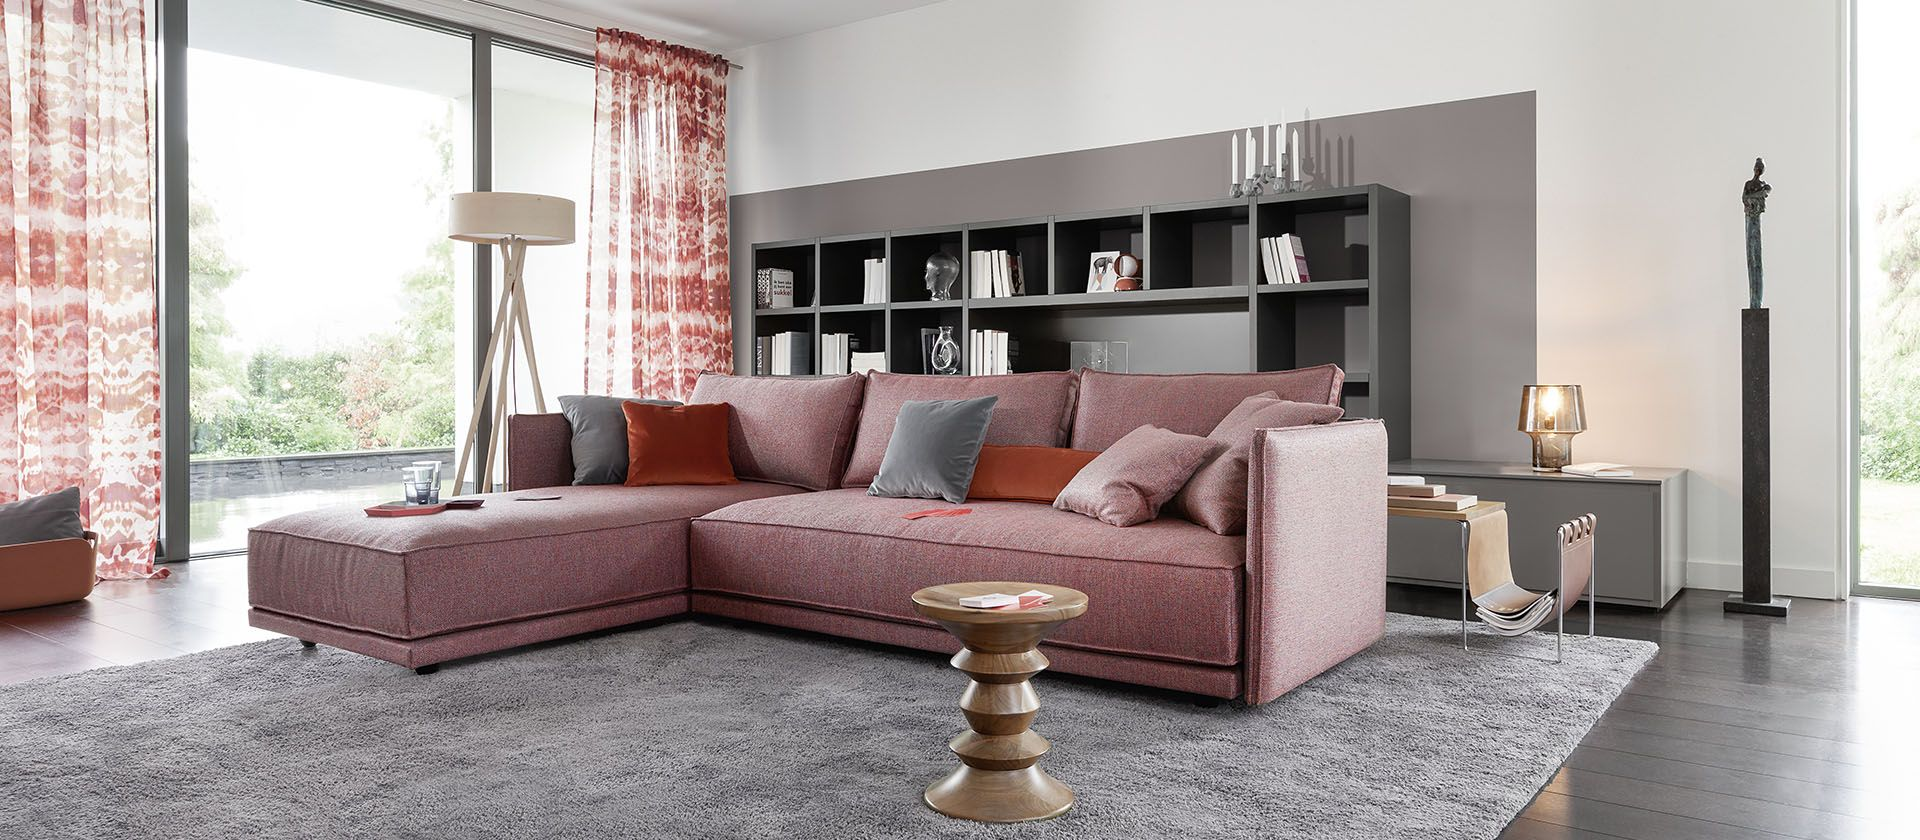 Cube Lounge Jab Furniture Modular Sofa Modular Lounges Sofa